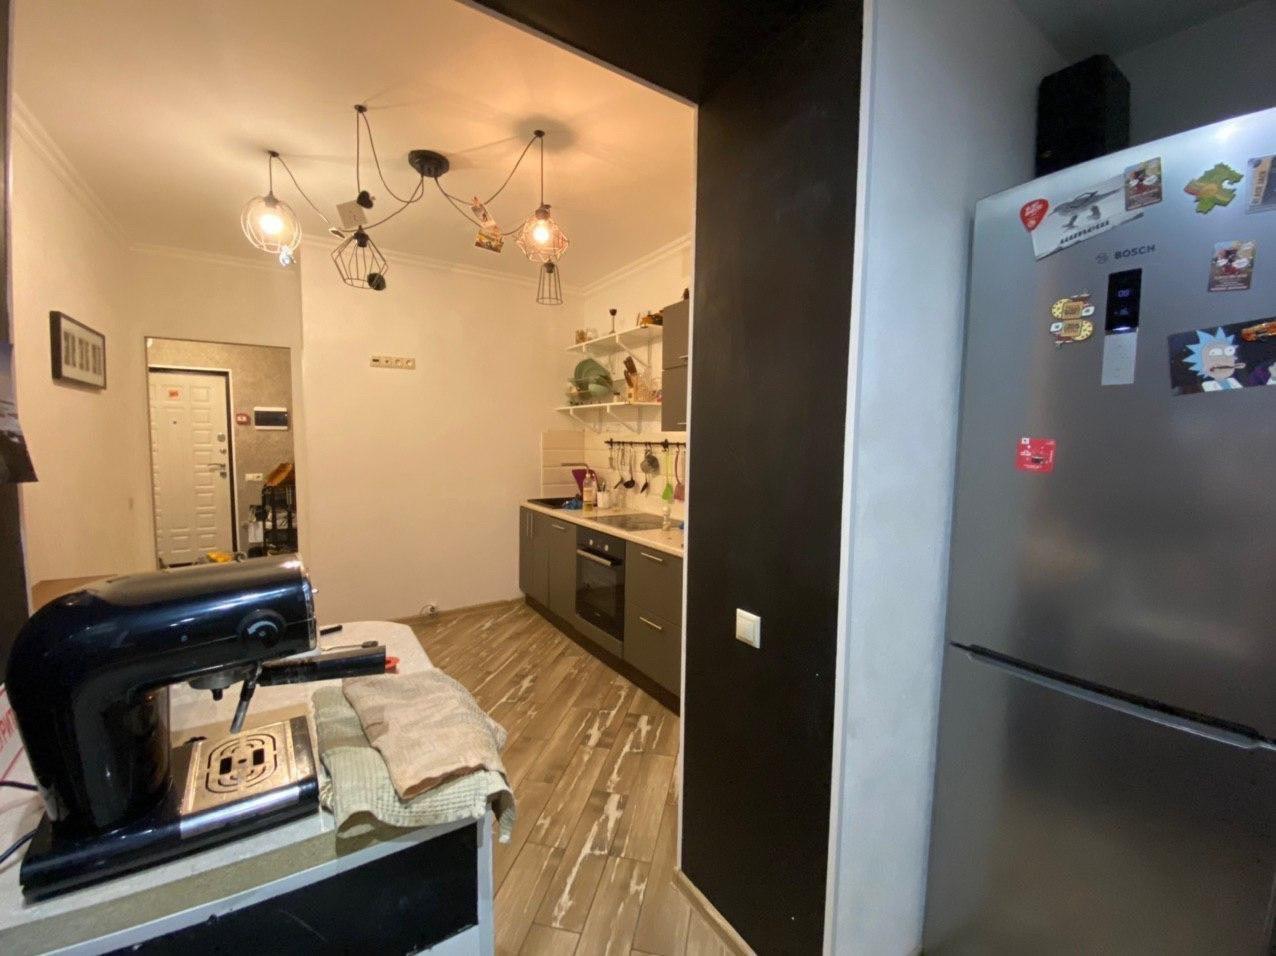 Квартира, 1 комната, 42 м² в Звенигороде 89999686698 купить 3